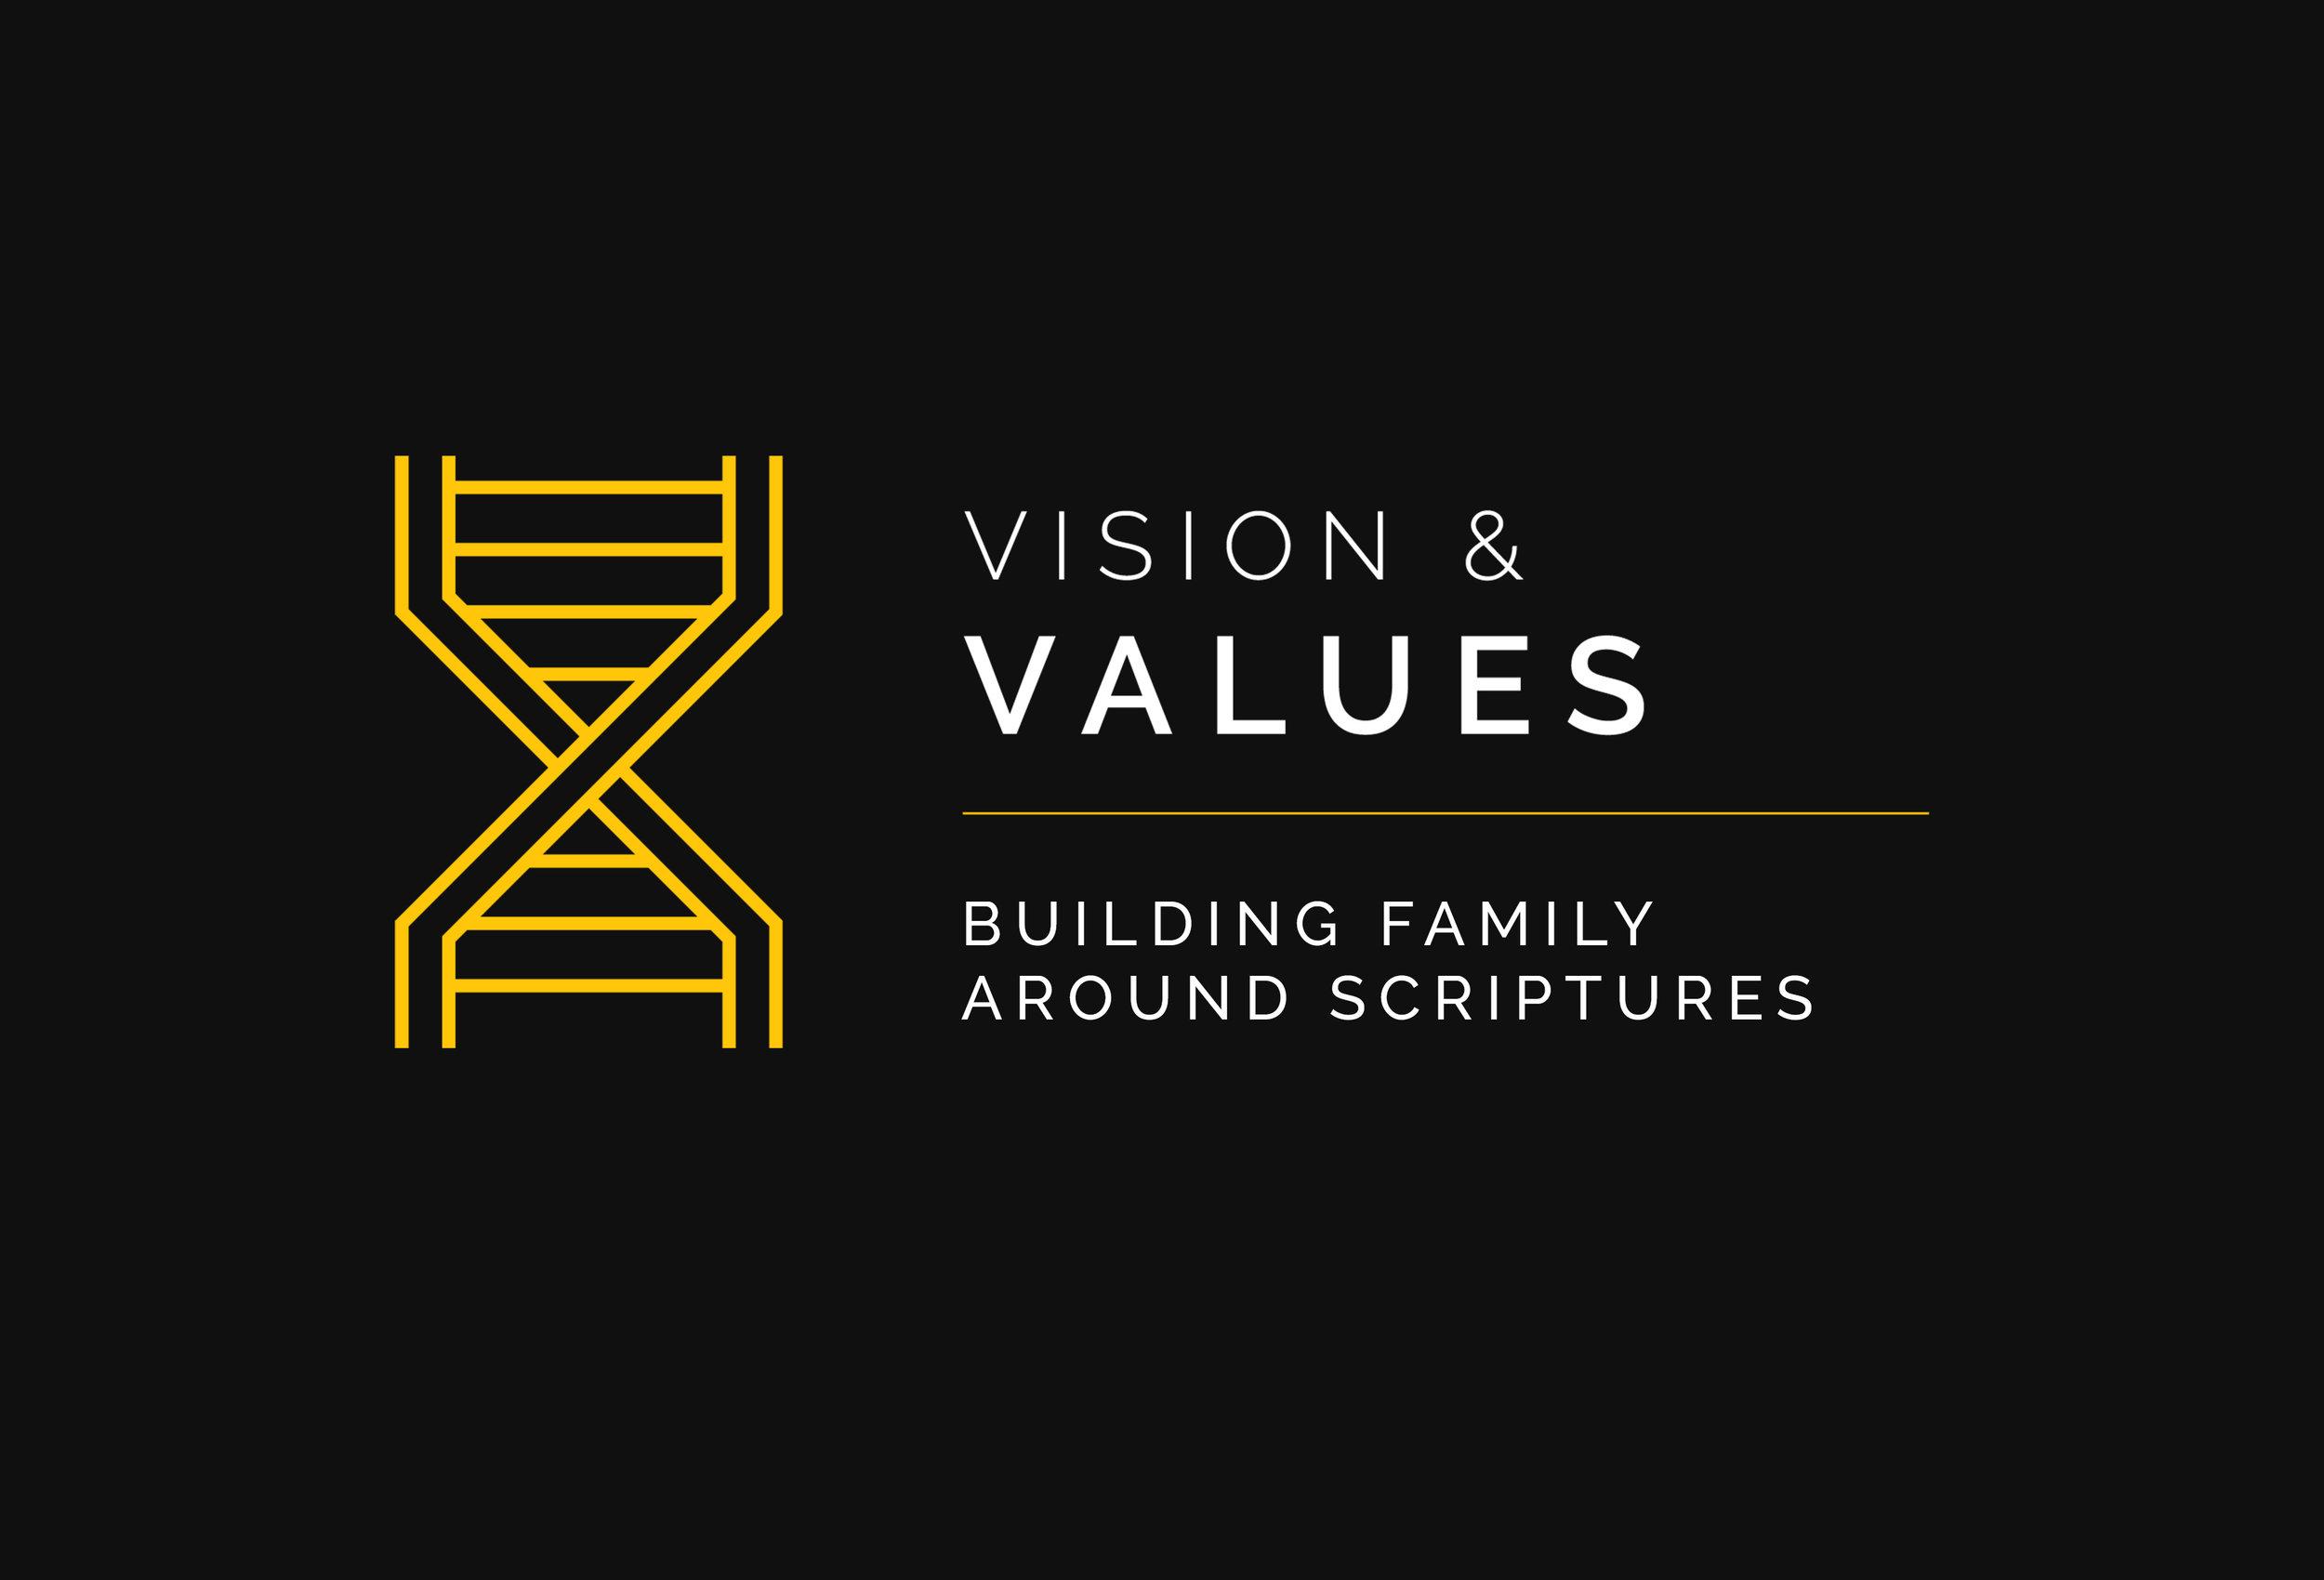 VisionValues-BuildingFamilyAroundScripture.jpg